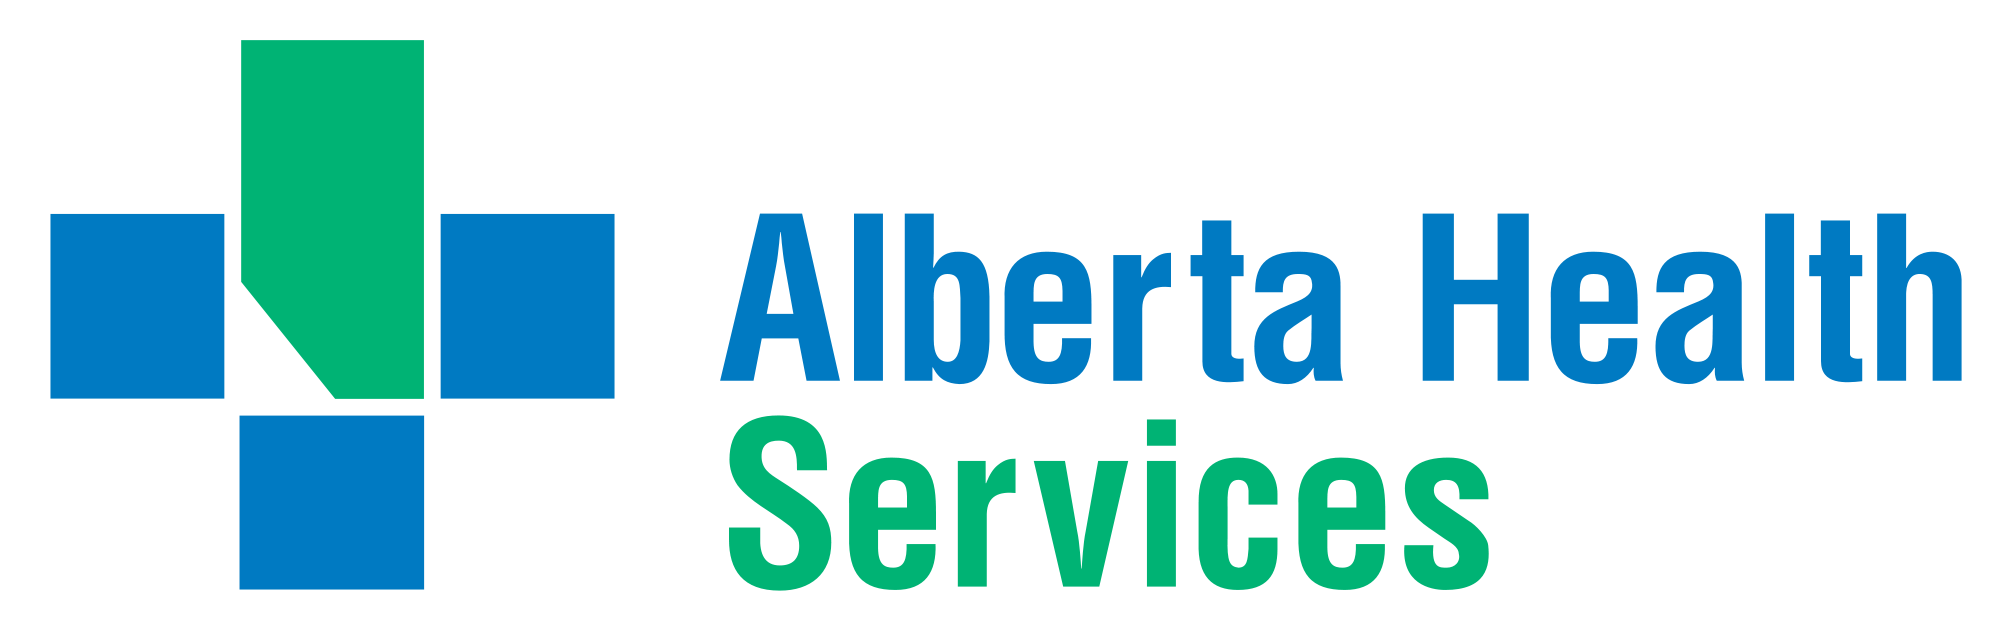 alberta-health-services-logo